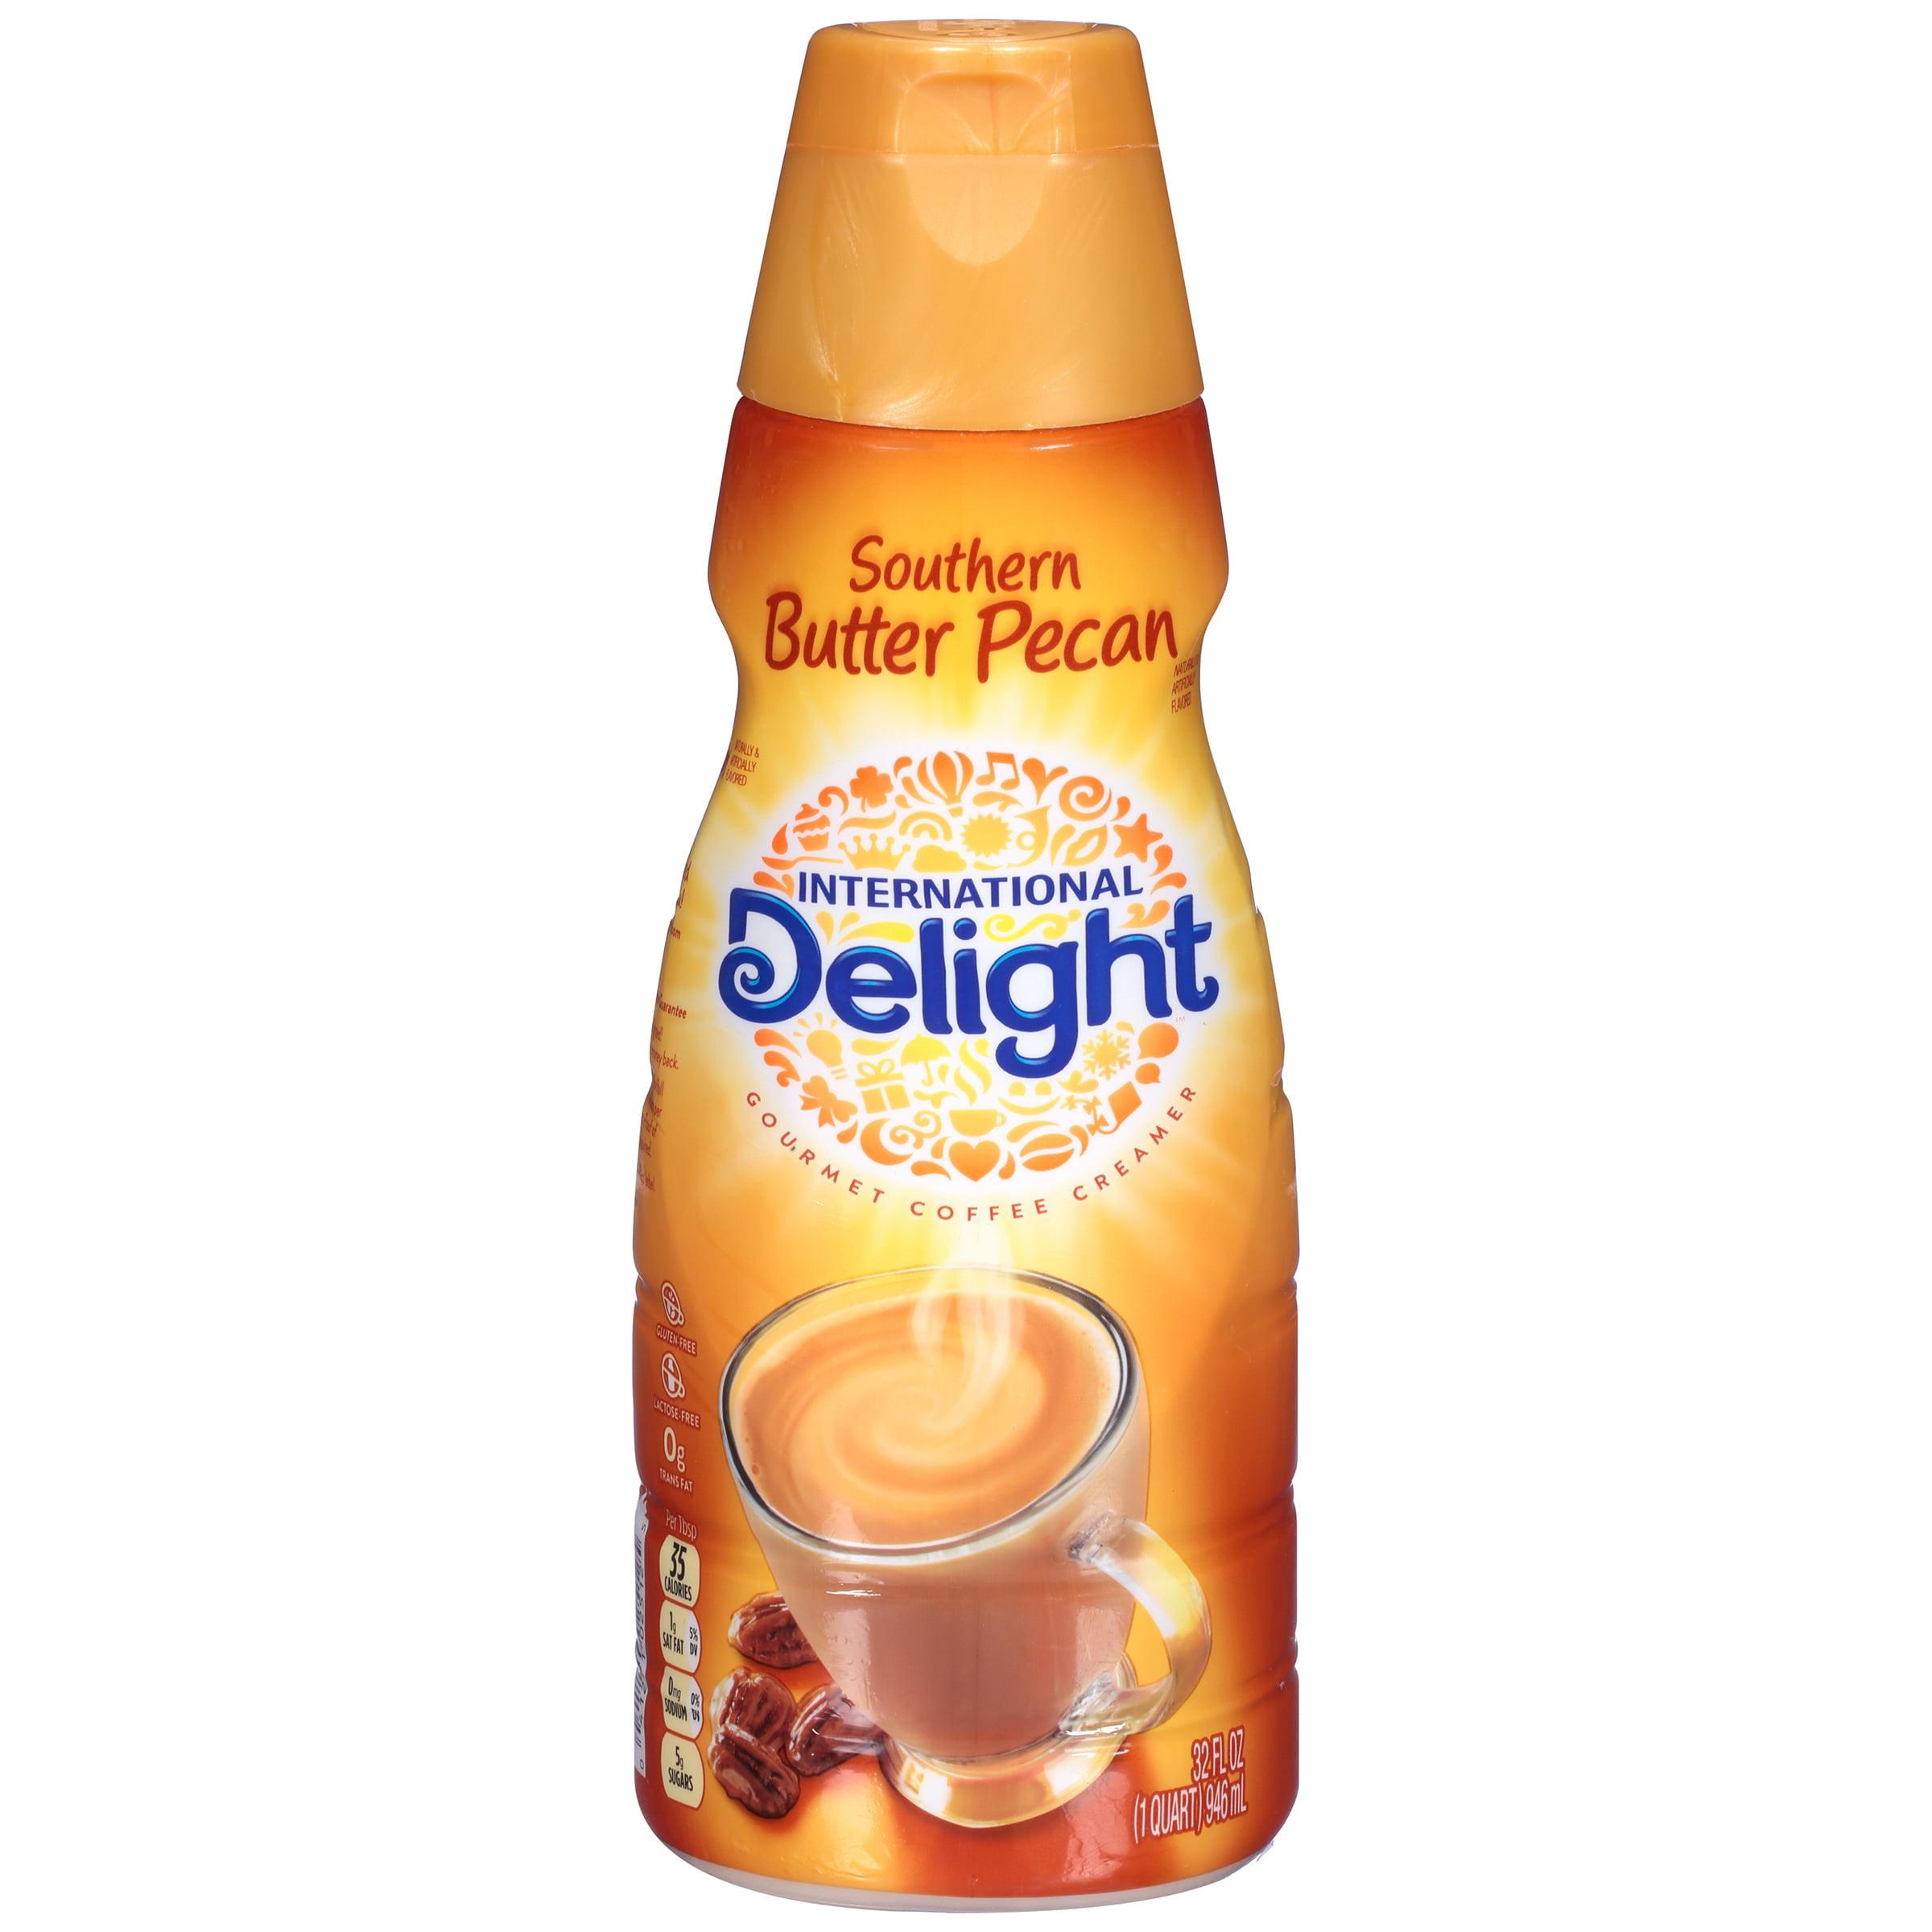 International Delight��� Southern Butter Pecan Gourmet Coffee Creamer 32 fl. oz.  Bottle